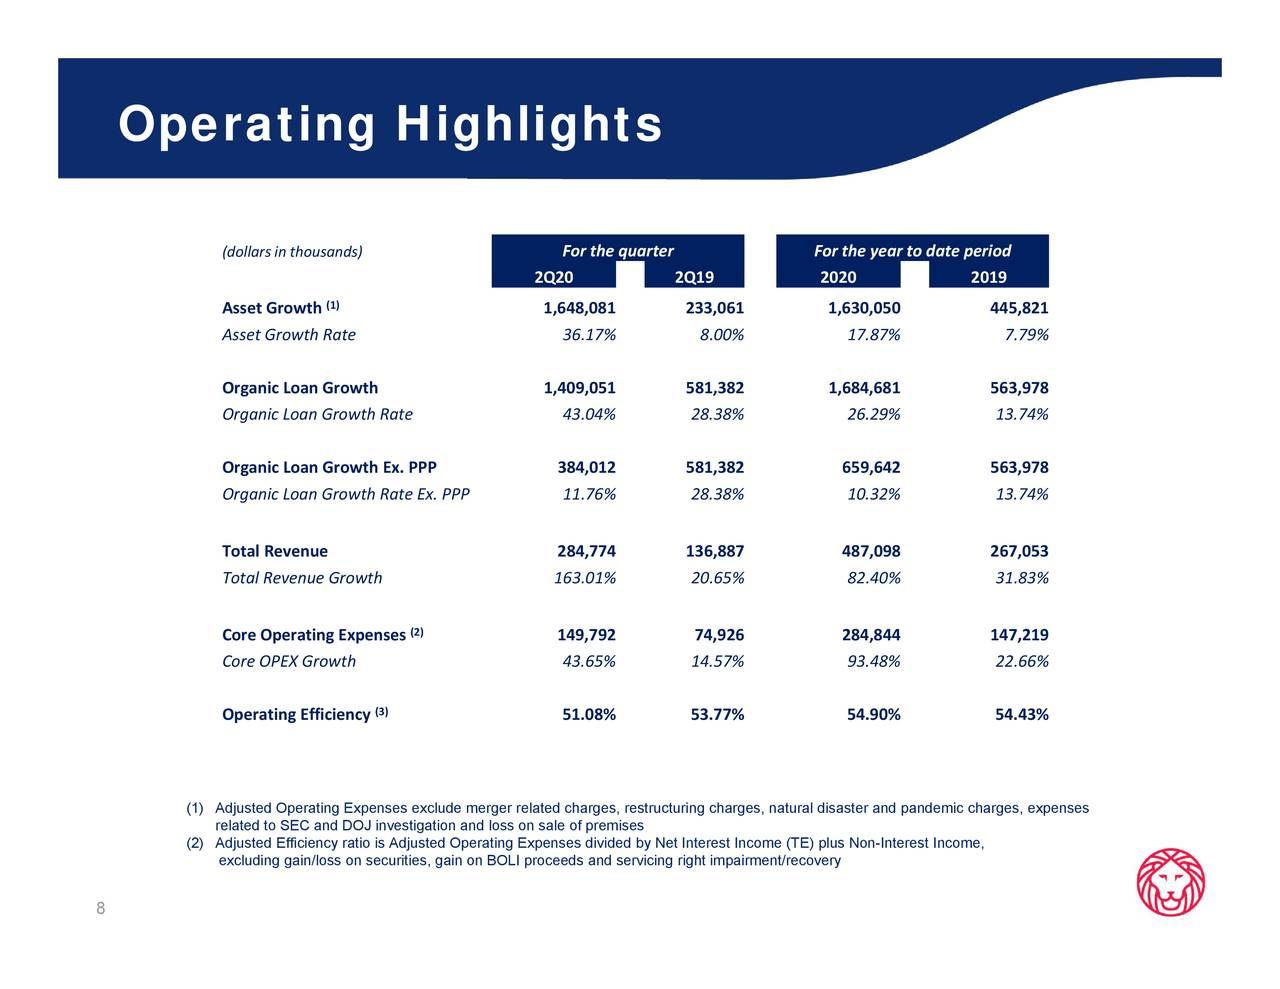 Ameris Bancorp 2020 Q2 Results Earnings Call Presentation